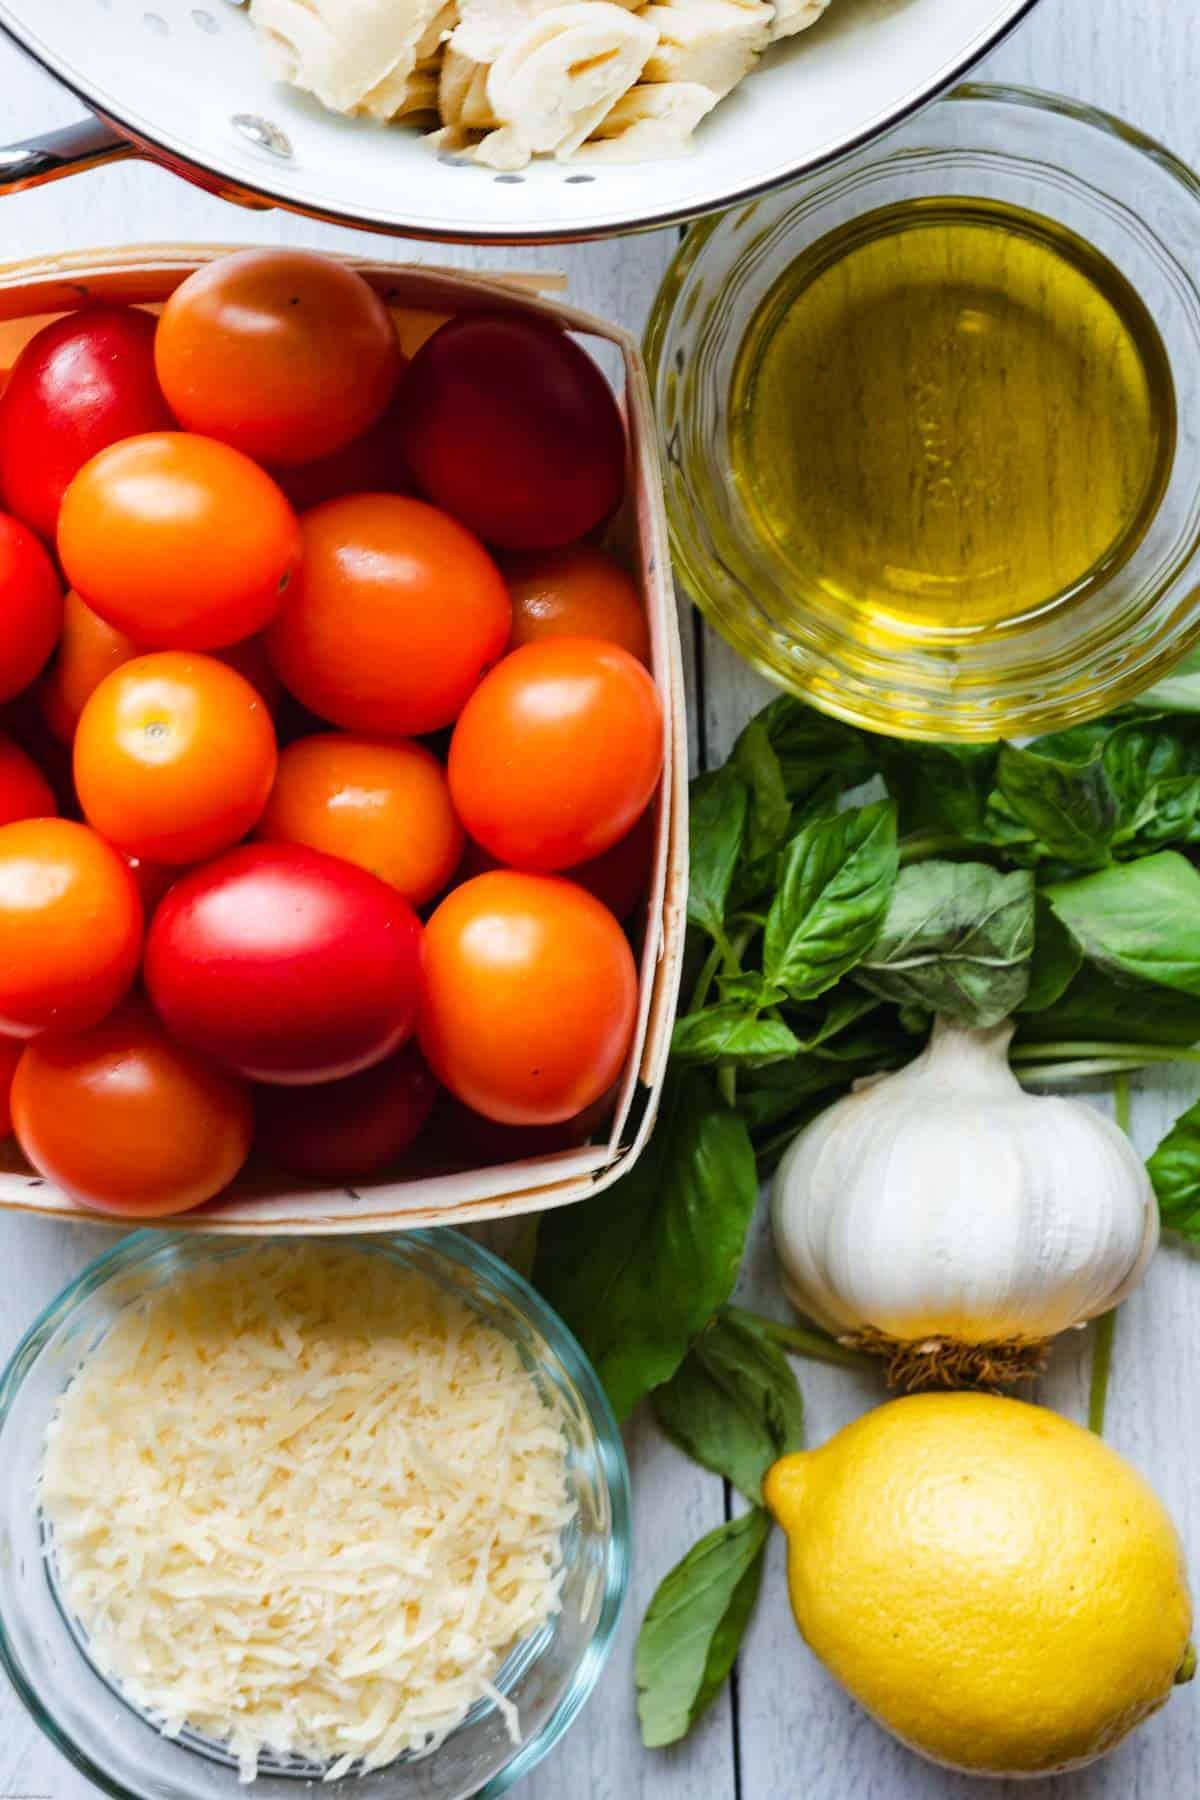 Grape tomatoes, cashews, vegan parmesan, lemon, garlic, fresh basil, and olive oil.